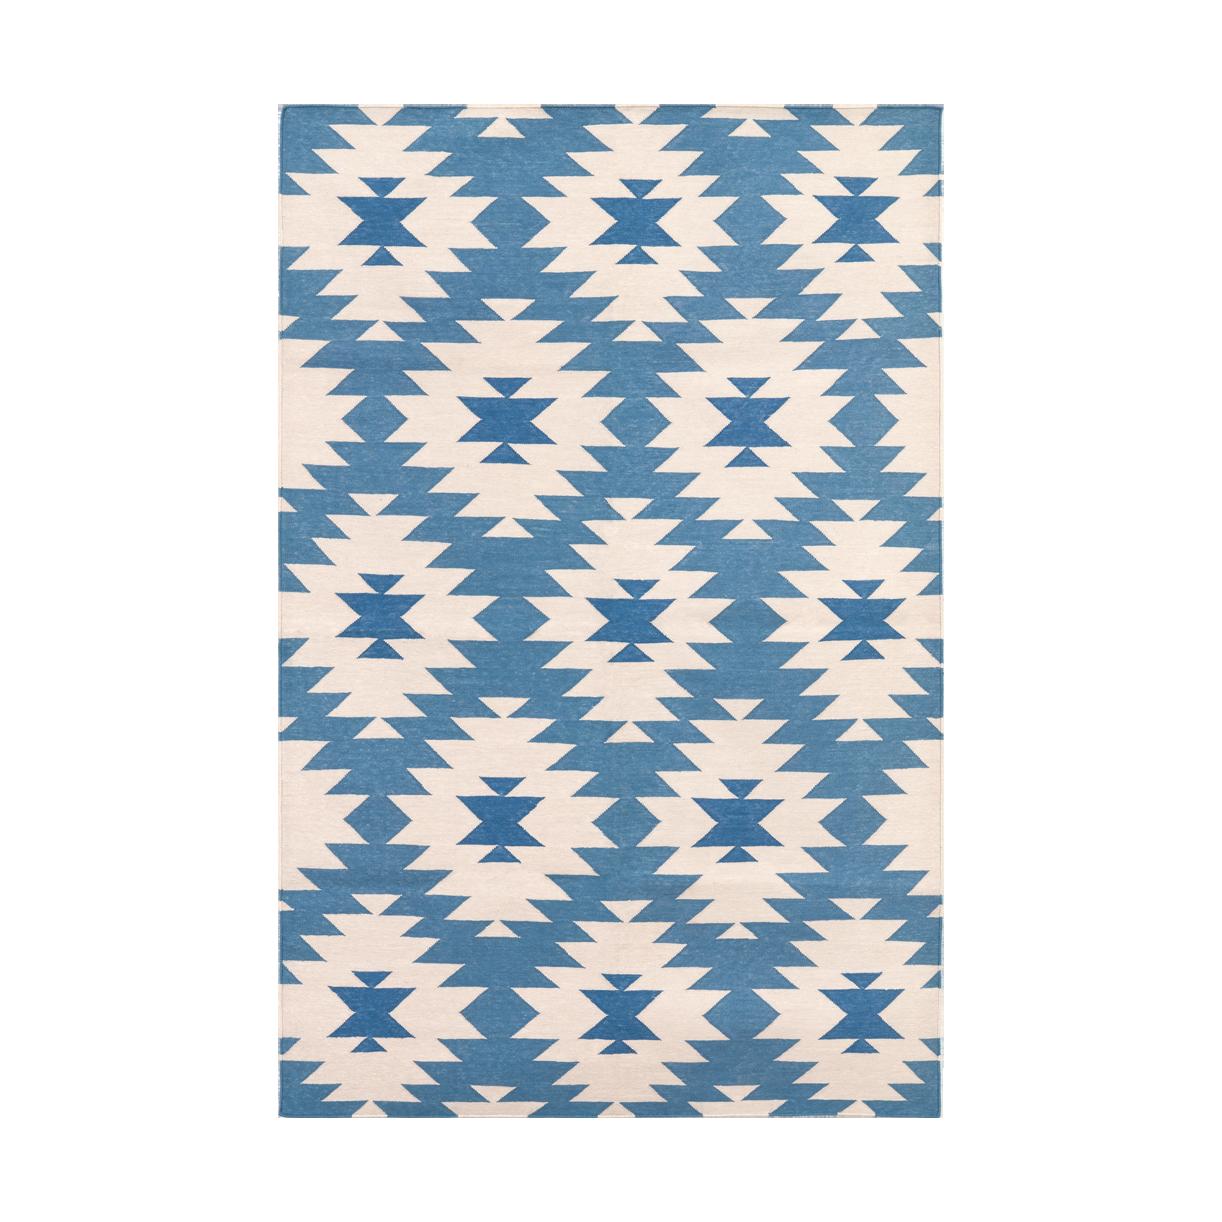 Light Blue Blue Jordan Cotton Carpet Cotton Carpet Rugs On Carpet Modern Furniture Decor